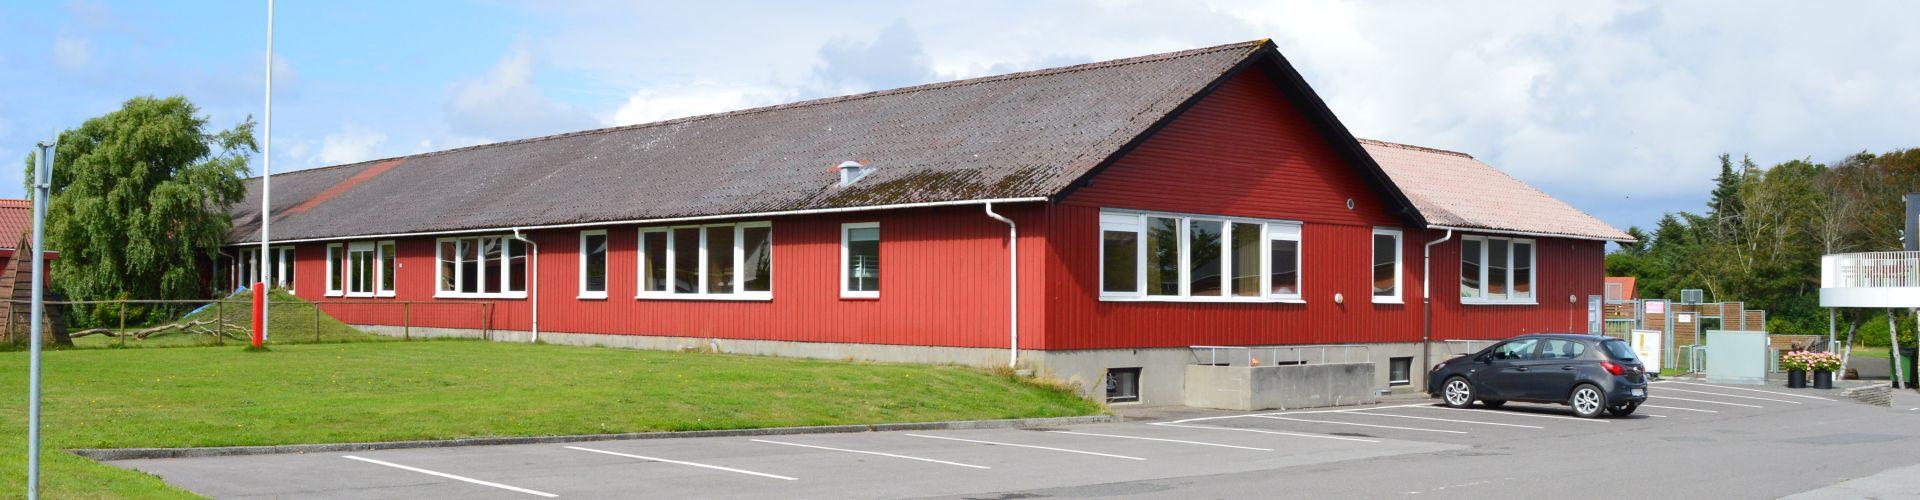 Nylig restaureret bygning